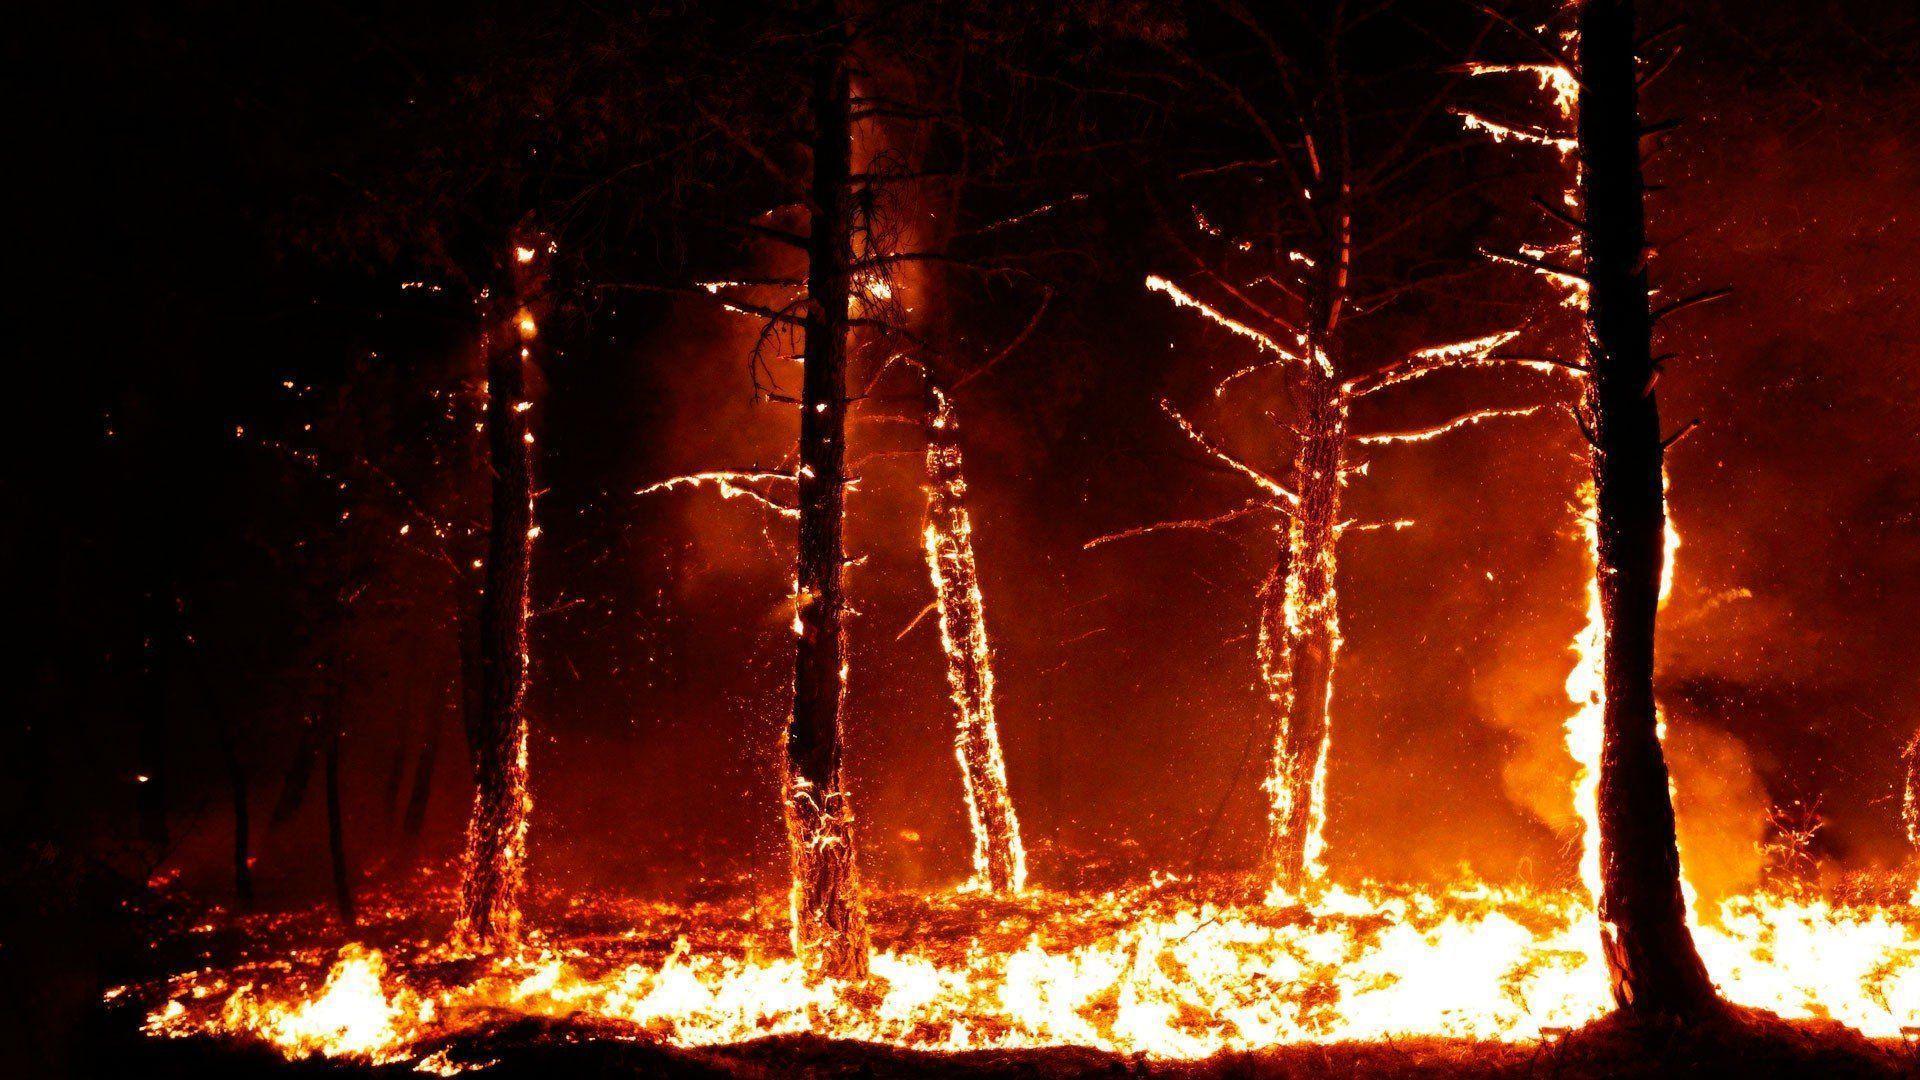 fire apocalypse background - photo #16